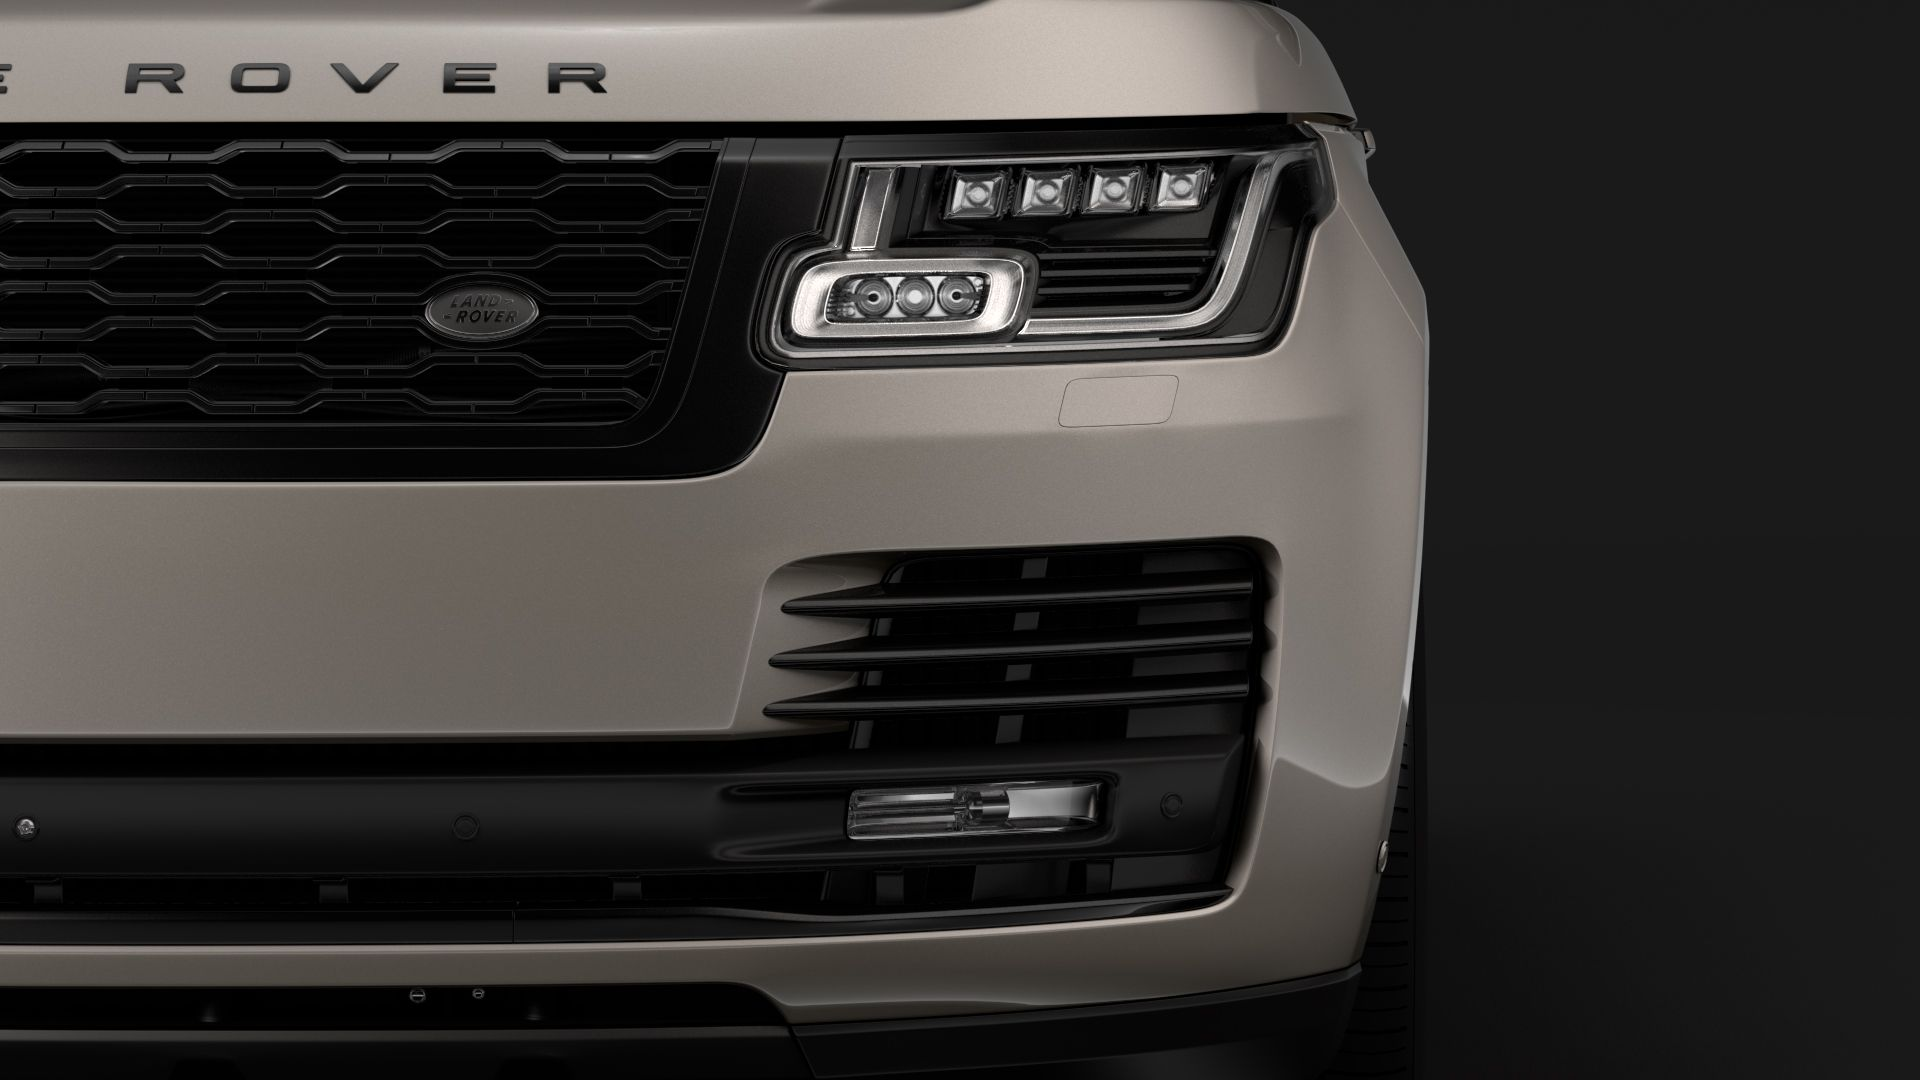 Range Rover Autobiography Hybrid (L405) 2018 | Diecast Model Cars